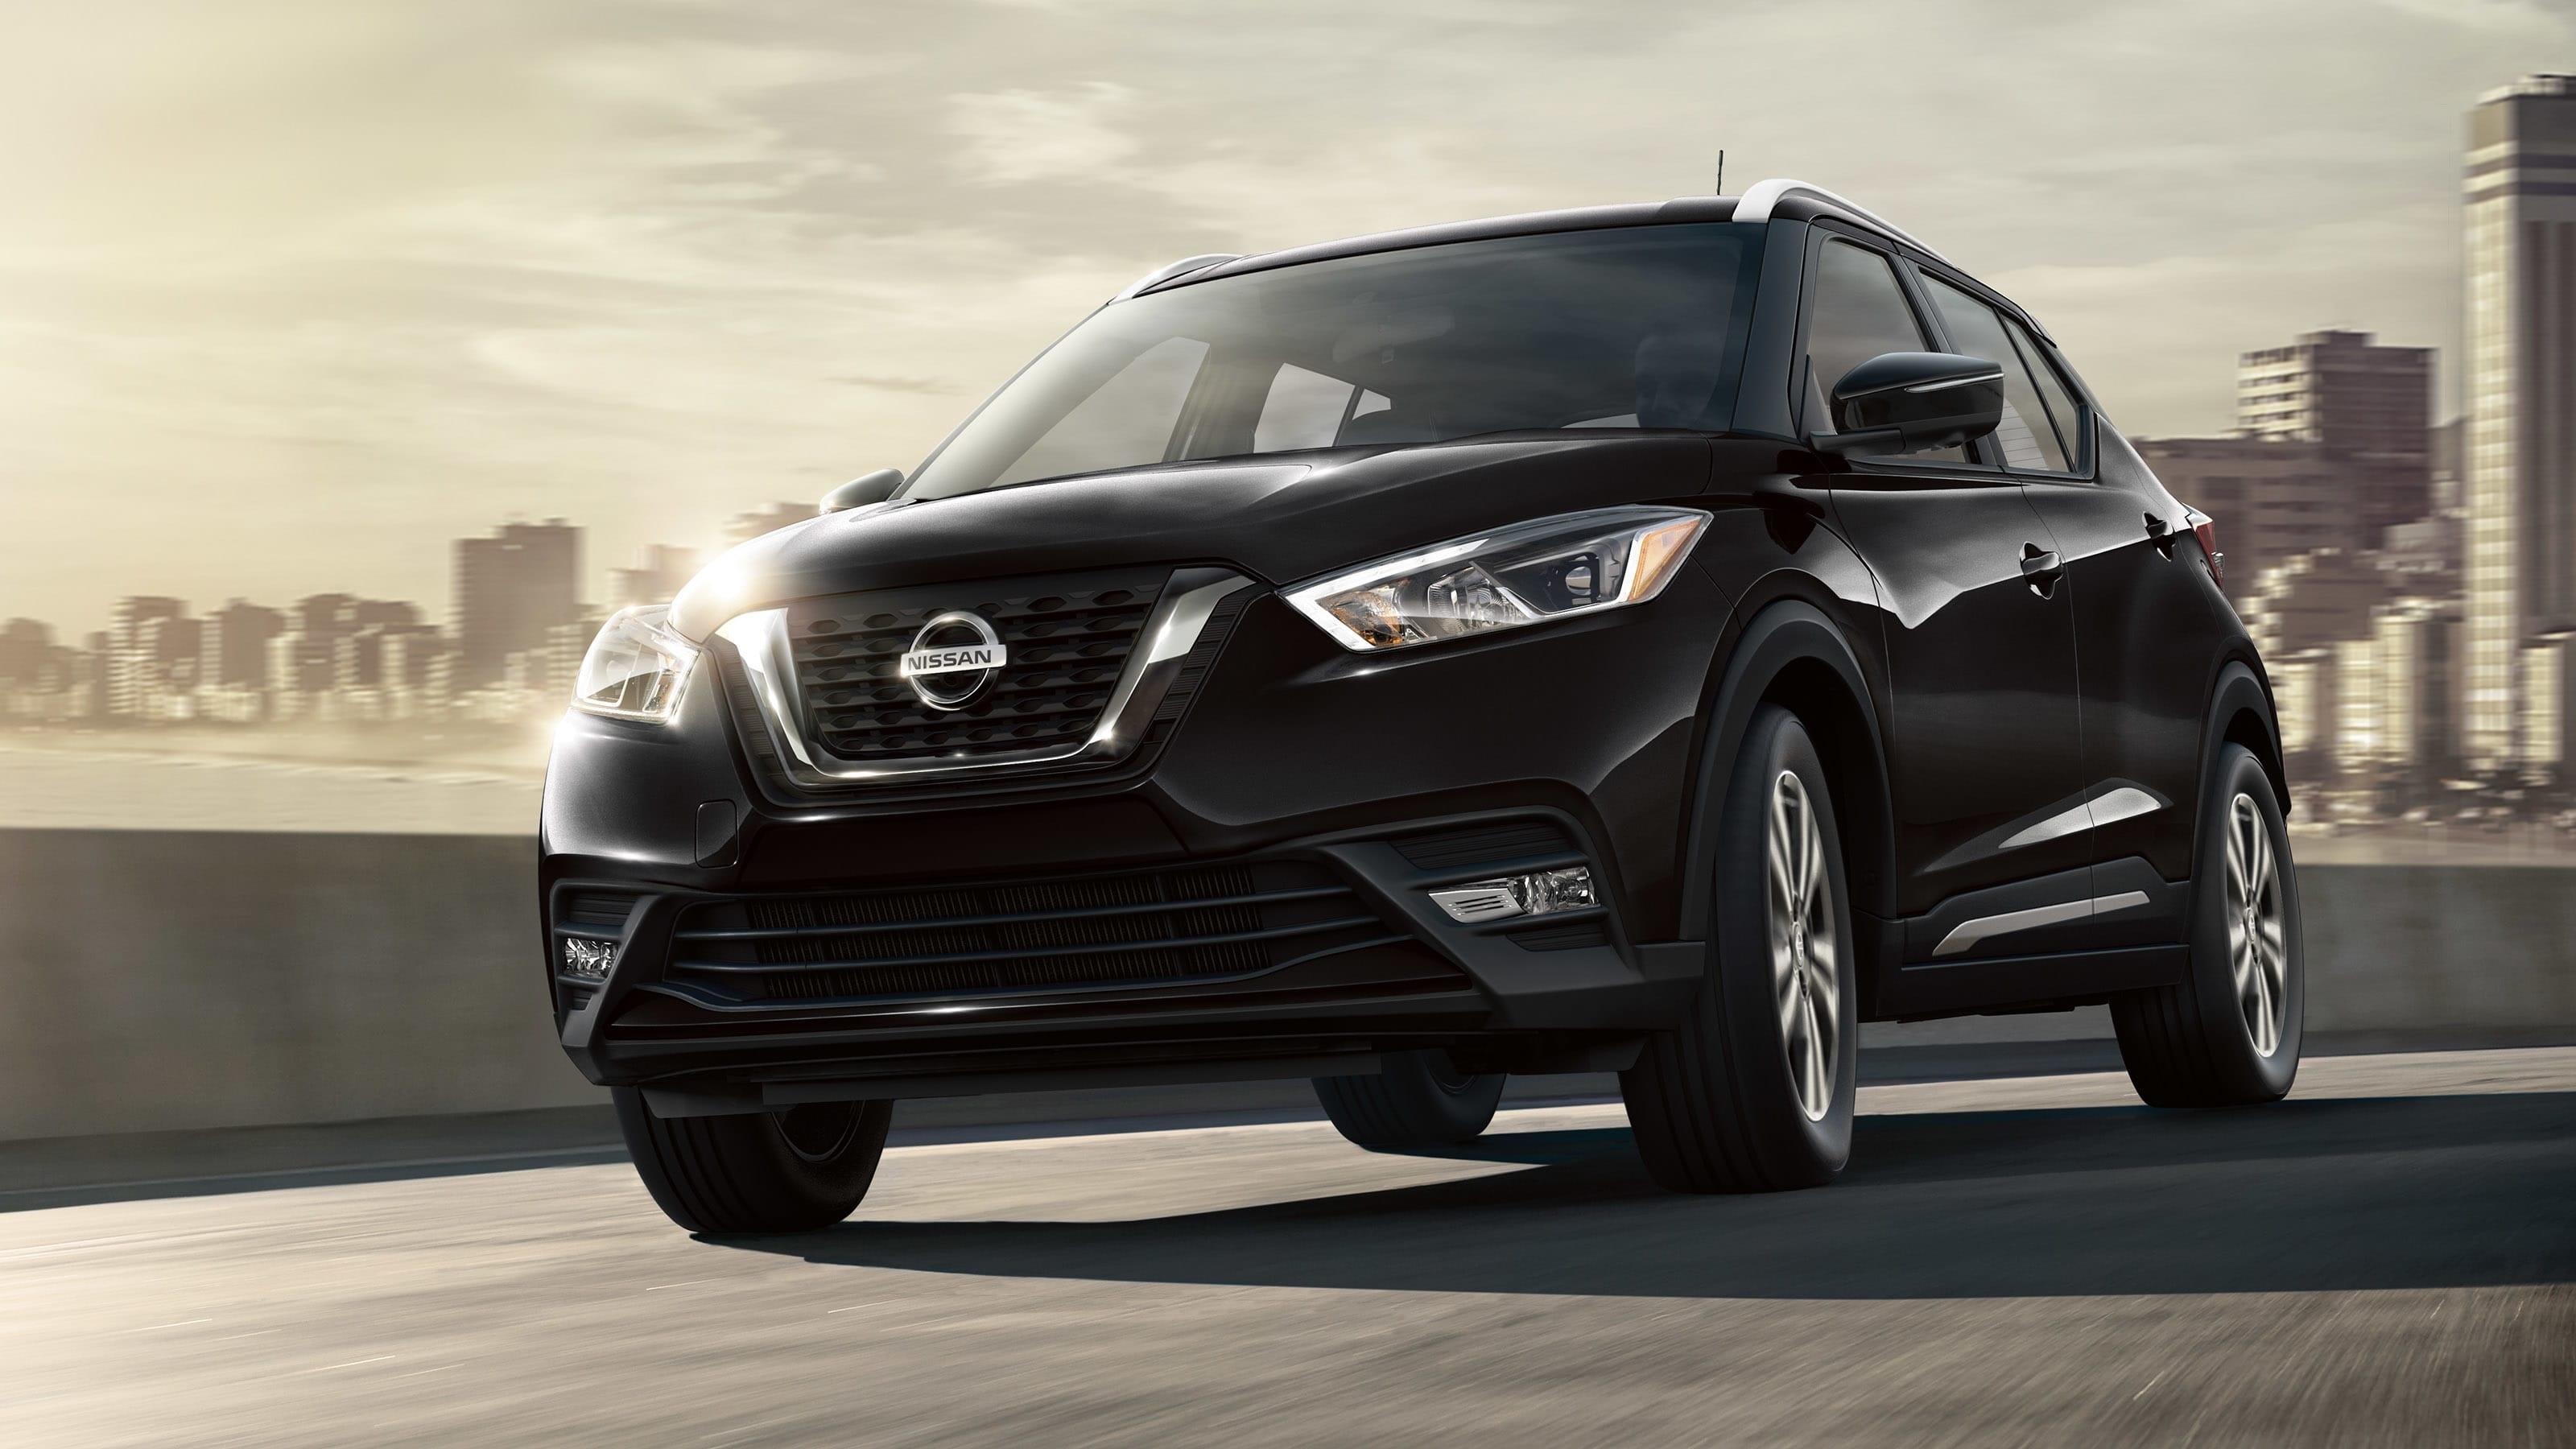 Compara El Nissan Kicks 2019 Vs El Hyundai Kona 2019 Pohanka Nissan Of Fredericksburg Espanol